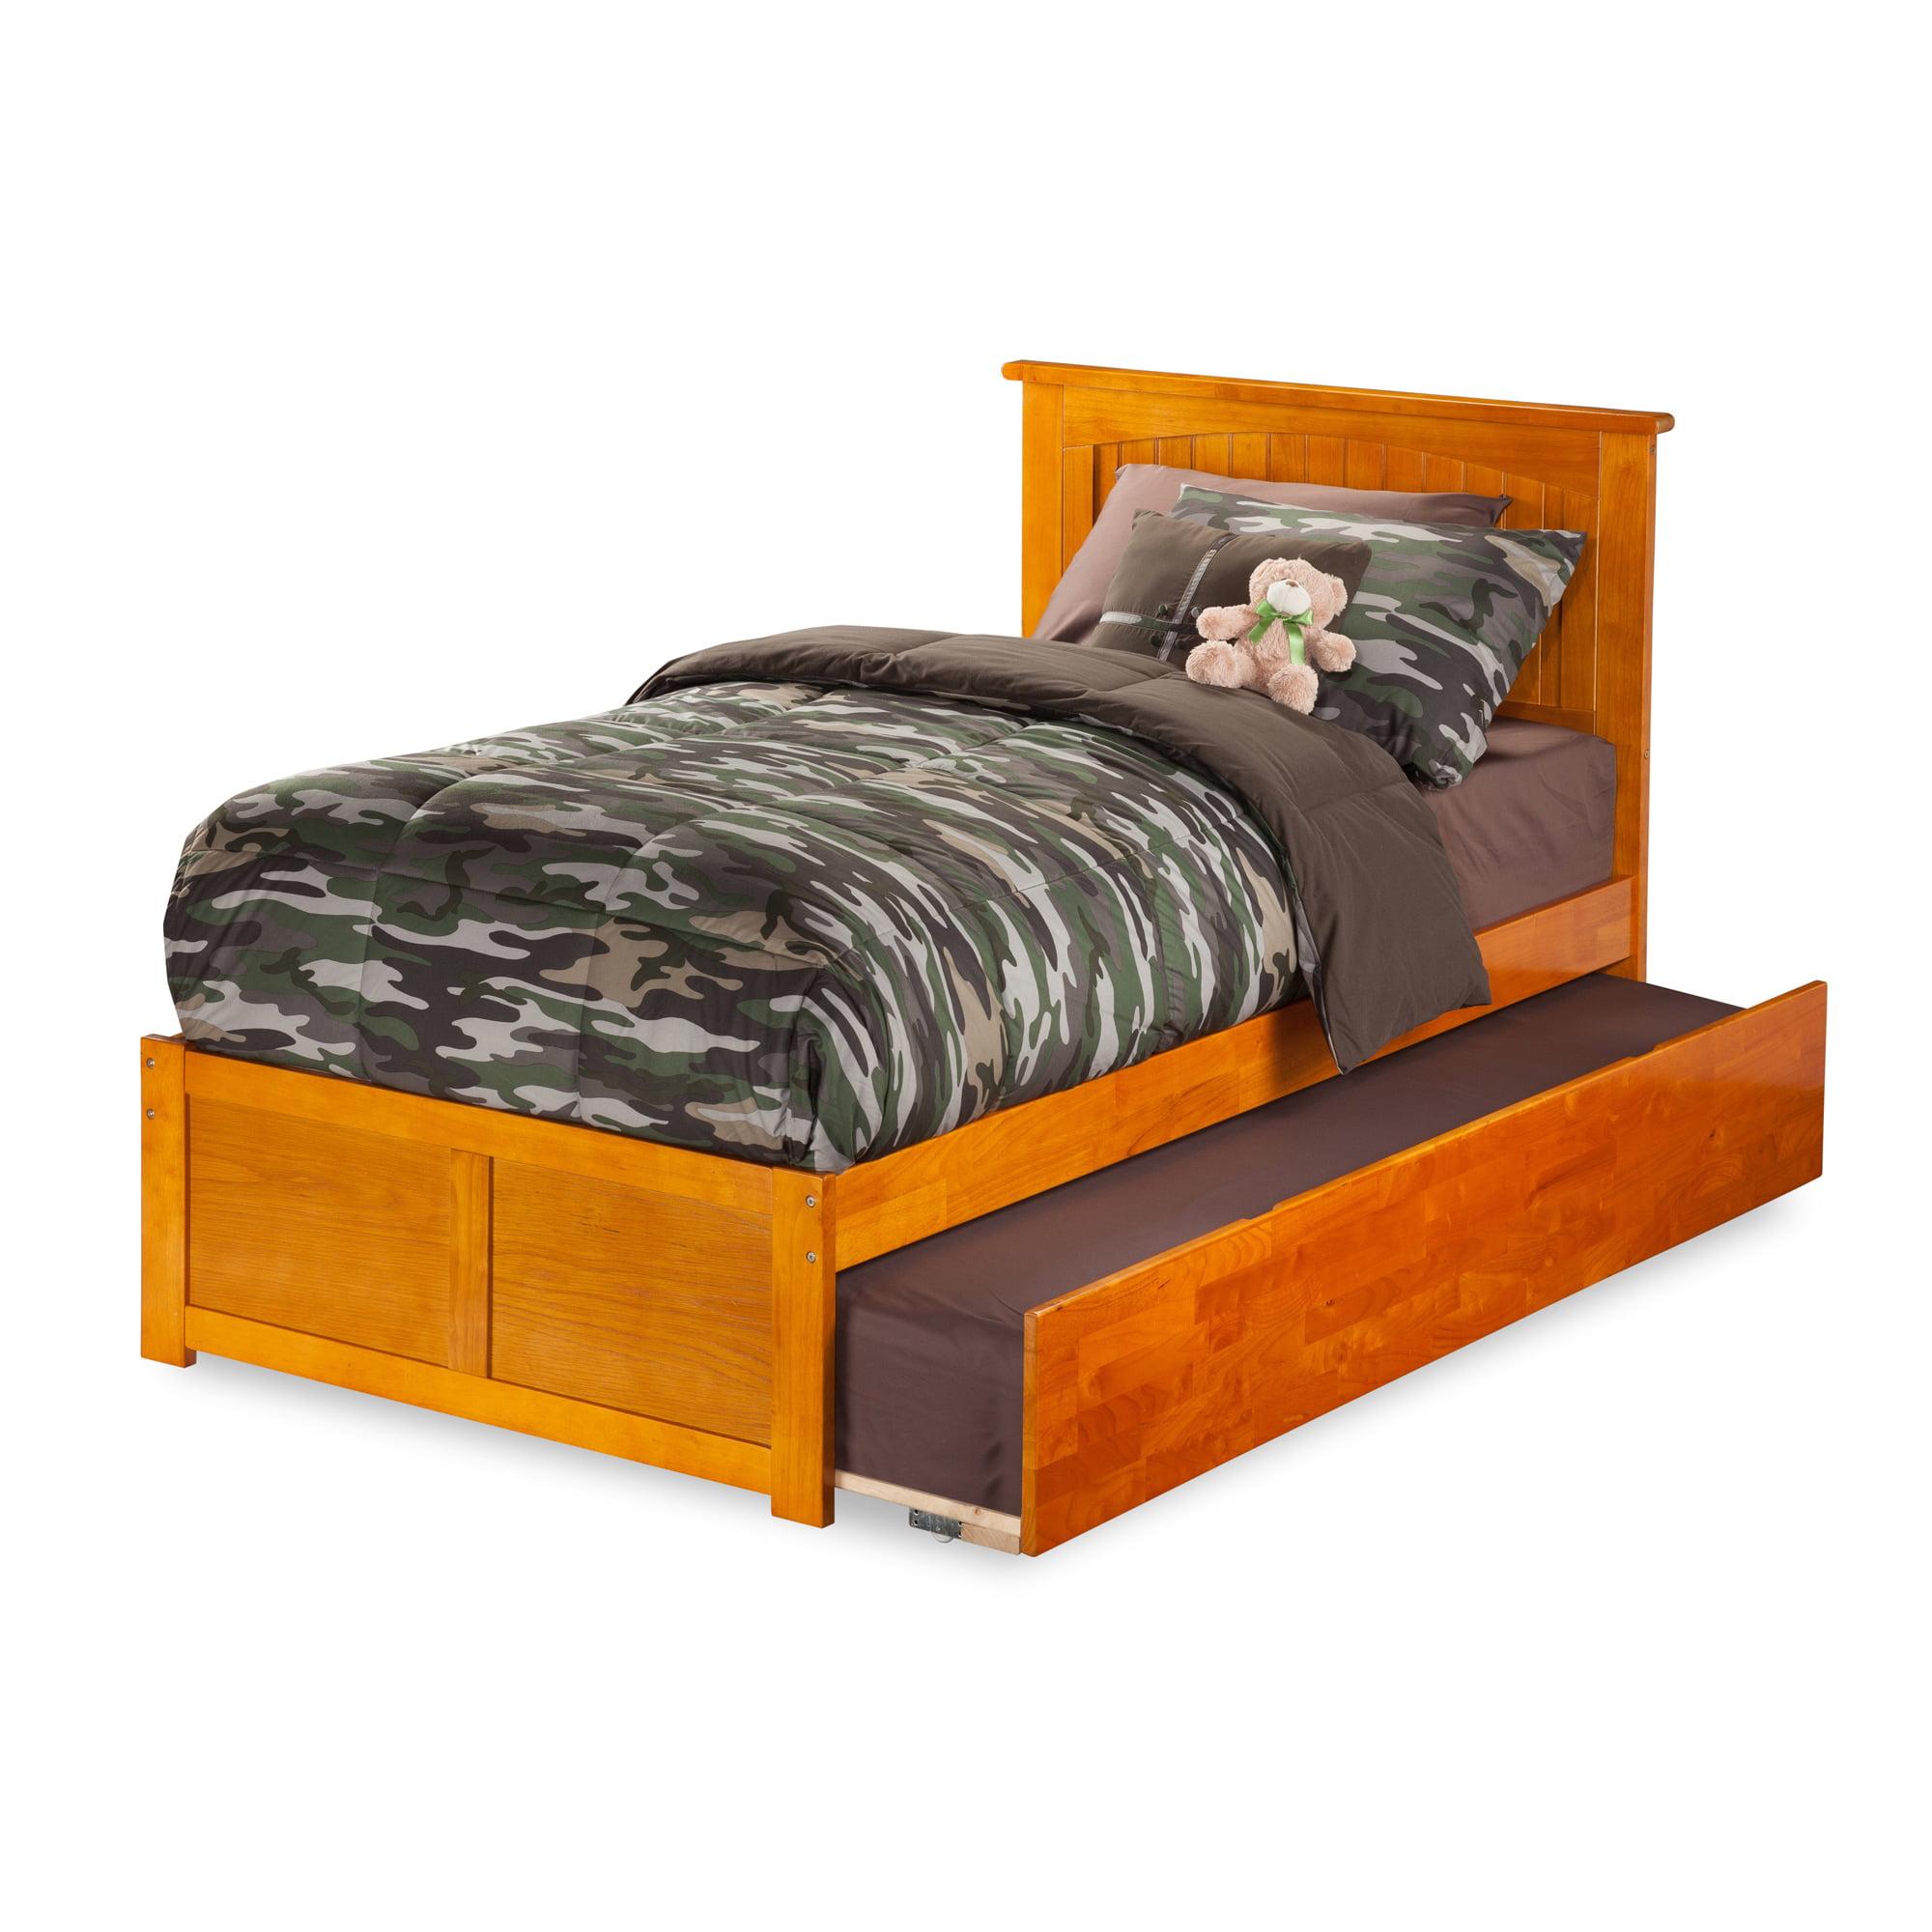 Atlantic Furniture Atlantic Nantucket Caramel Latte Twin Flat-panel Footboard Trundle Bed by Overstock